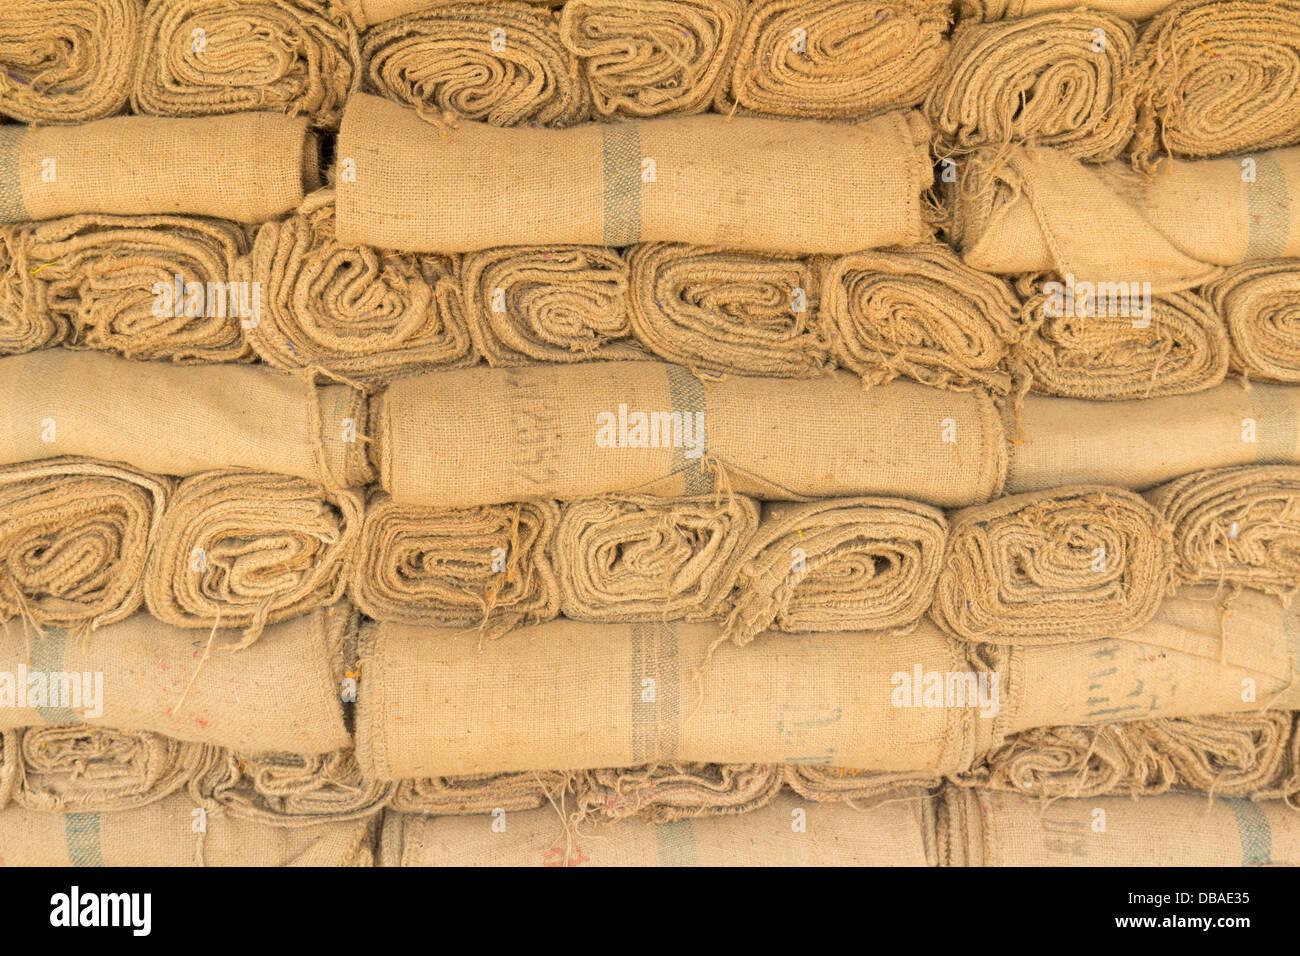 Hemp sacks in a row set unavailable - Stock Image